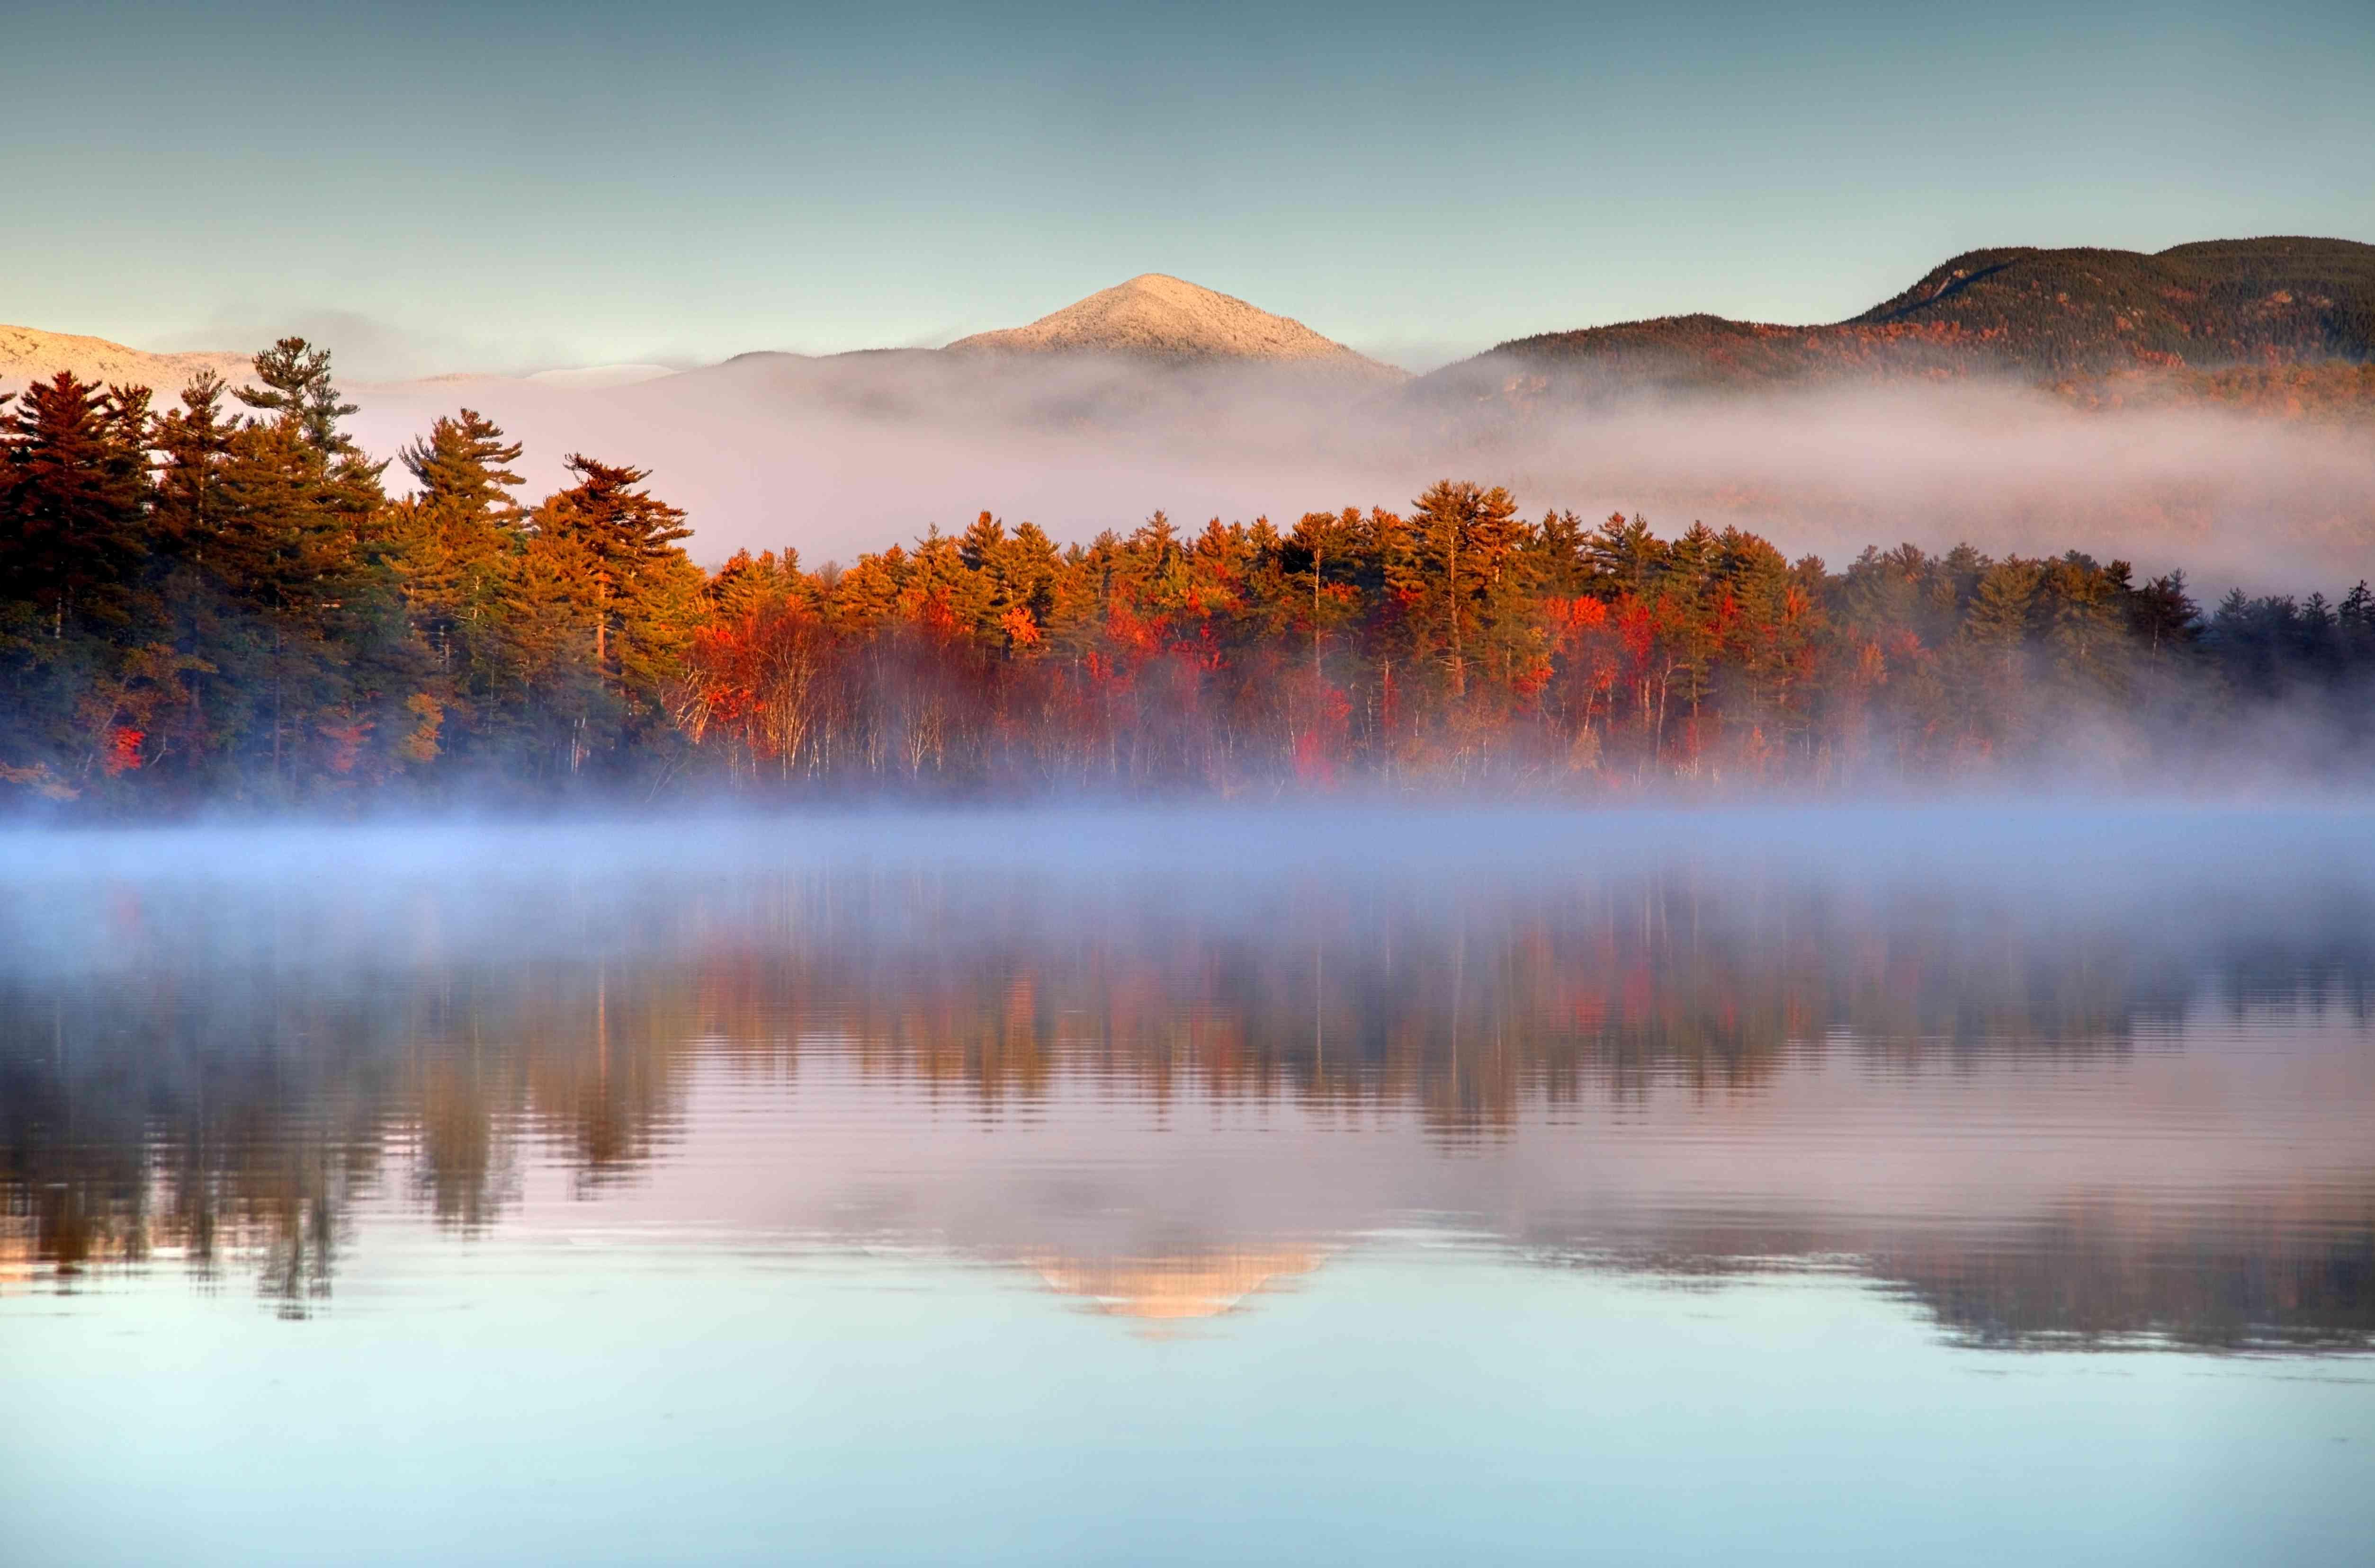 Autumn snowcapped White Mountains in New Hampshire